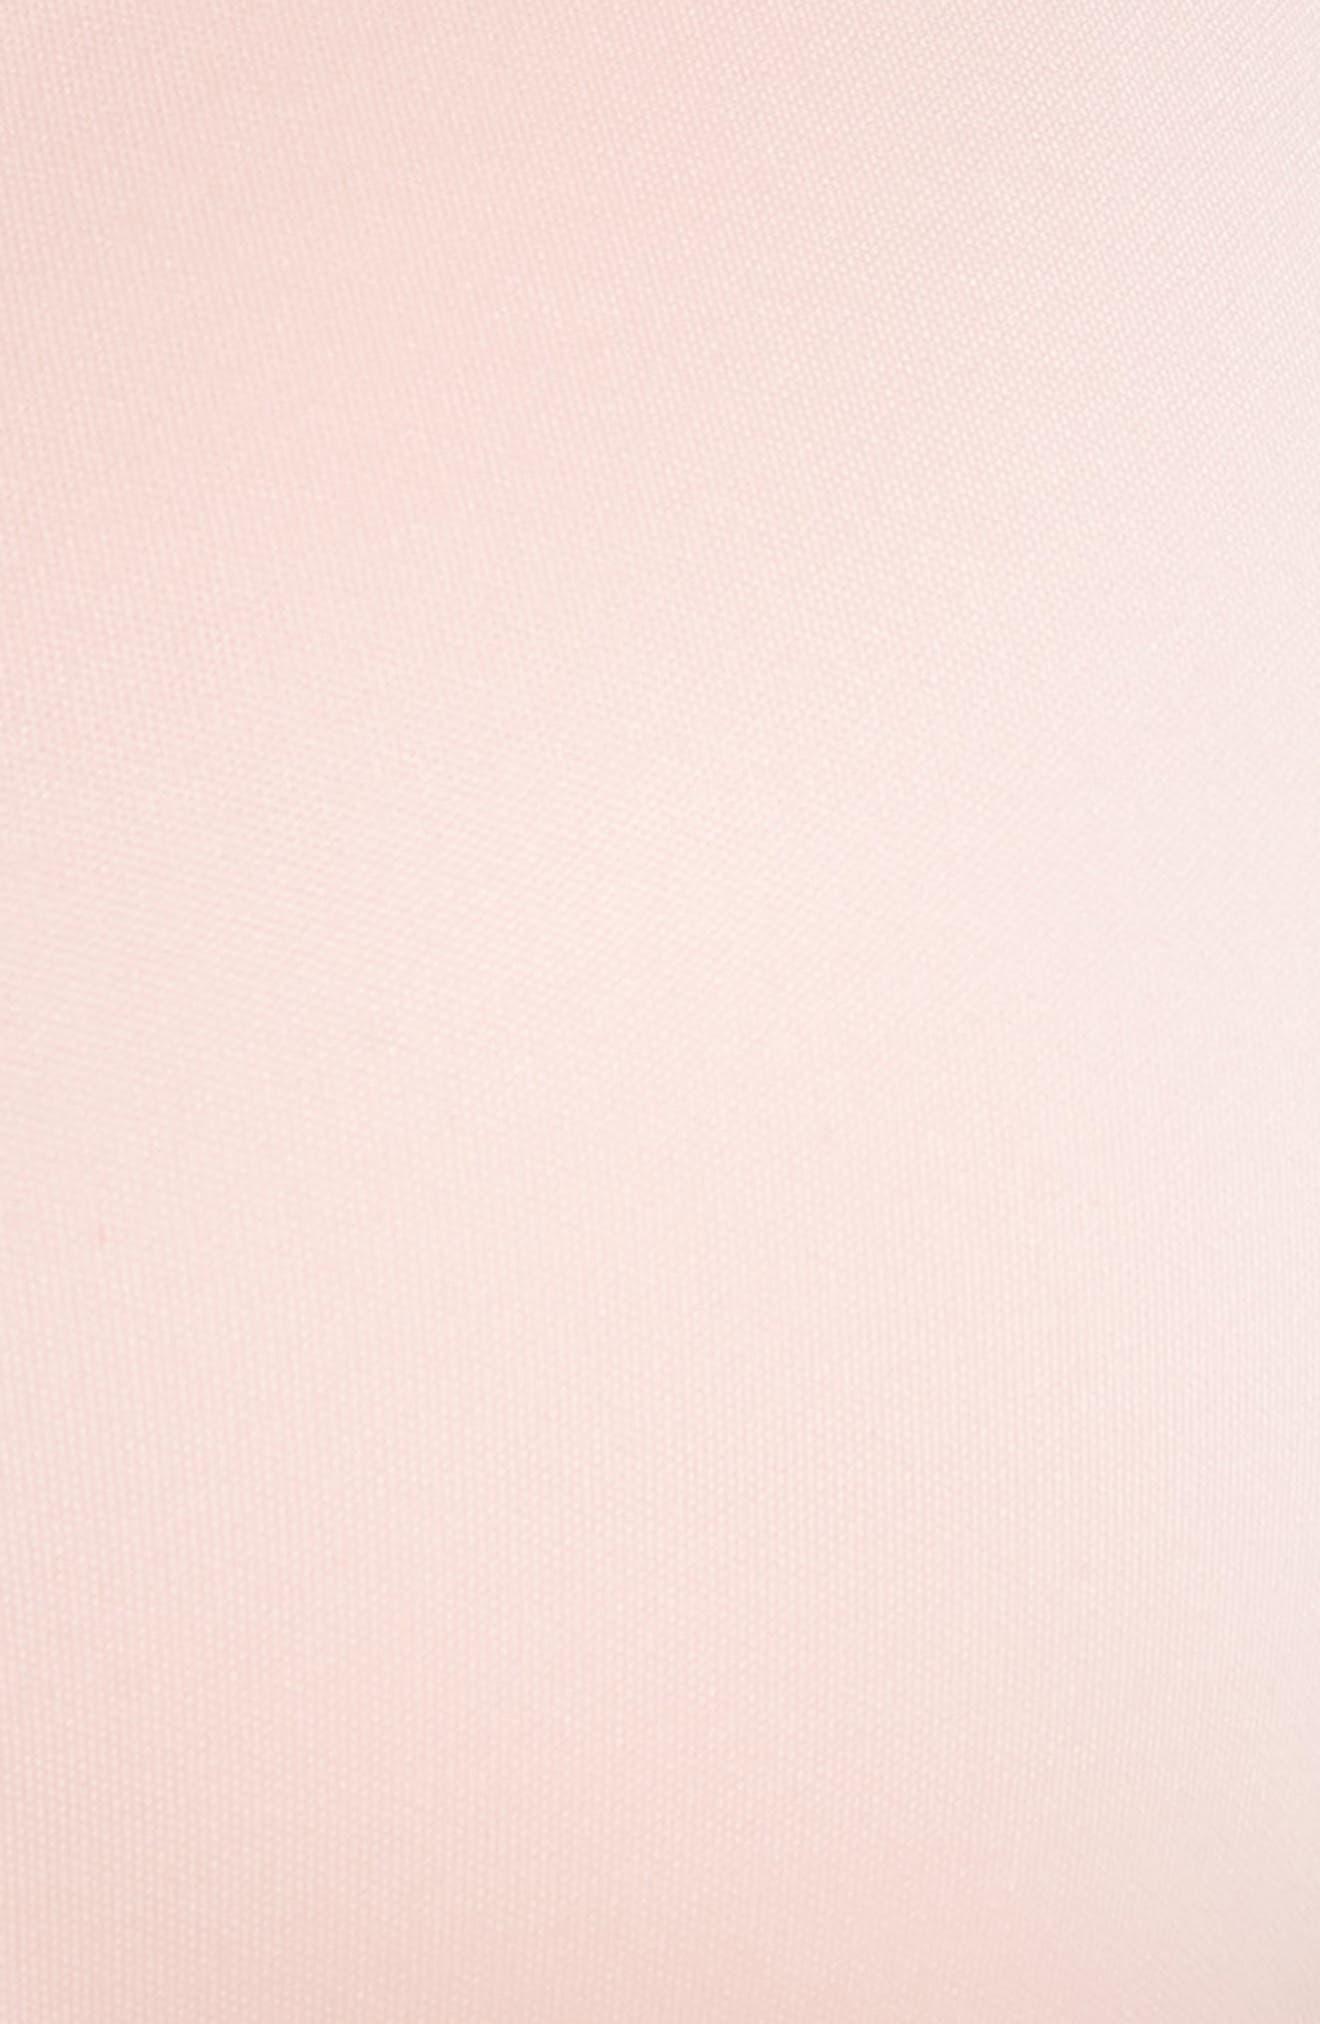 C Magnifique Underwire Spacer Bra,                             Alternate thumbnail 6, color,                             Blushing Pink